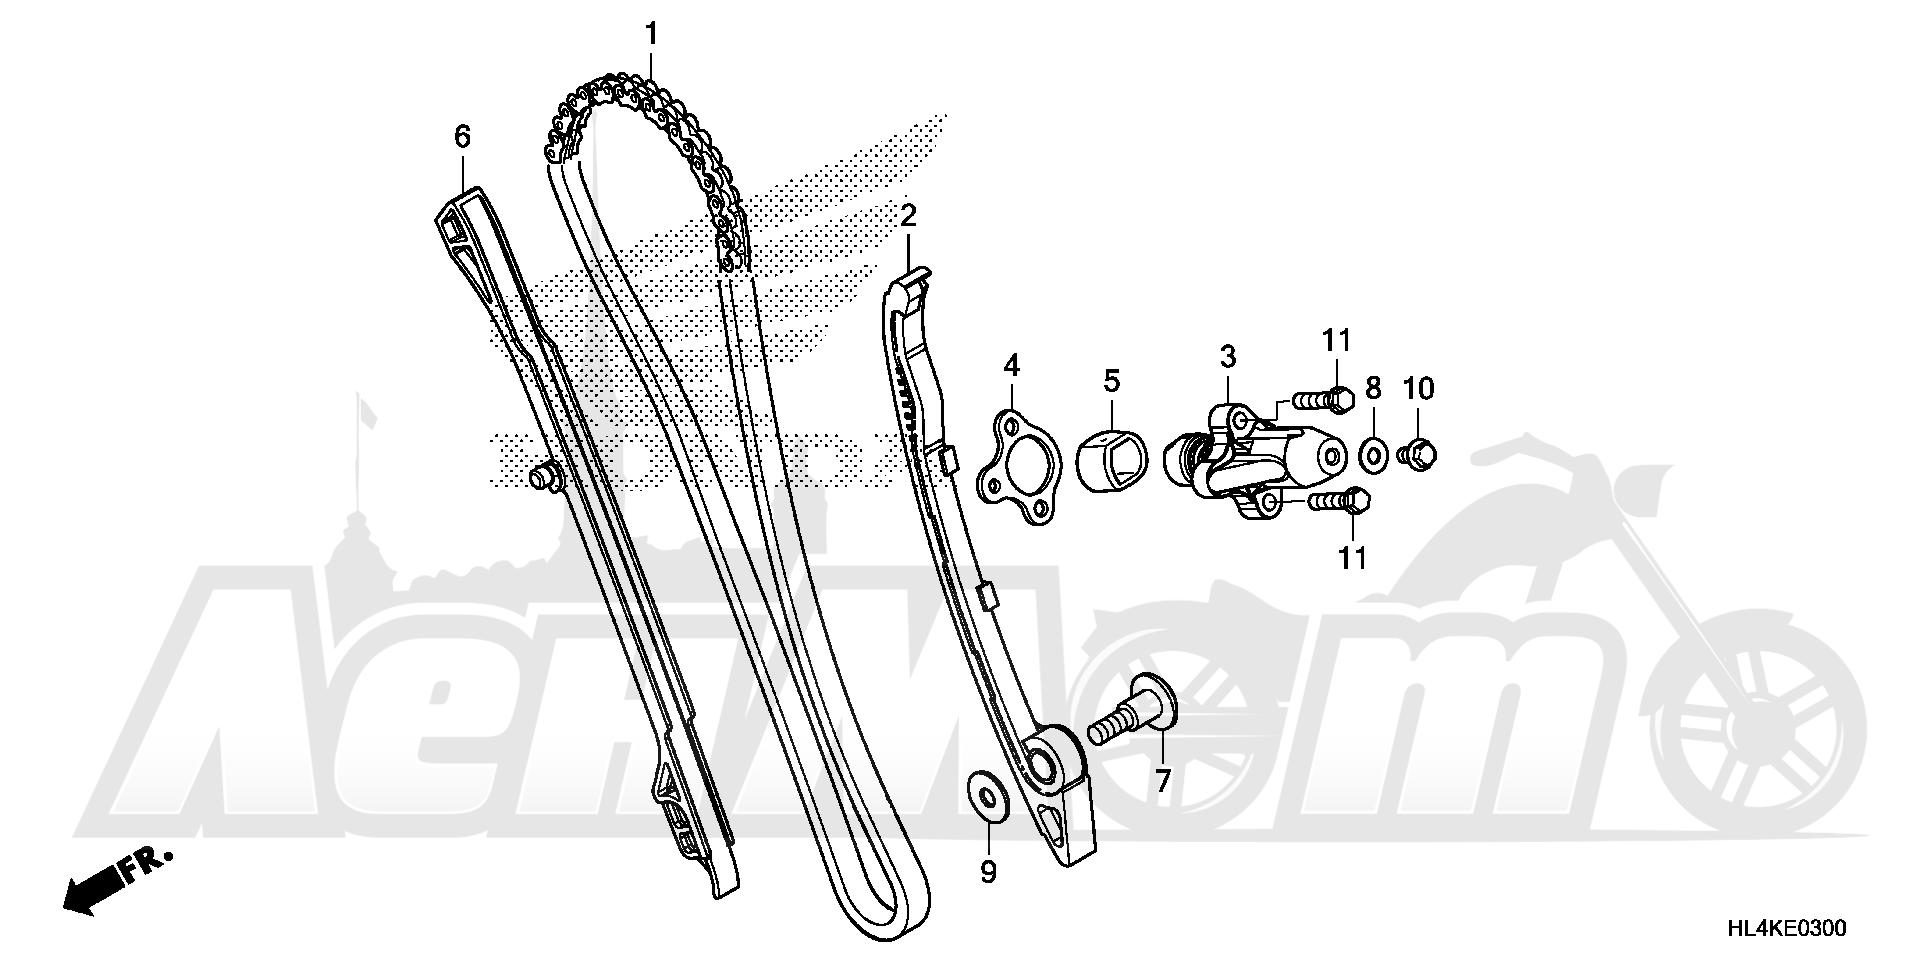 Запчасти для Квадроцикла Honda 2019 SXS1000M5P Раздел: CAM CHAIN AND TENSIONER | цепь грм и натяжитель